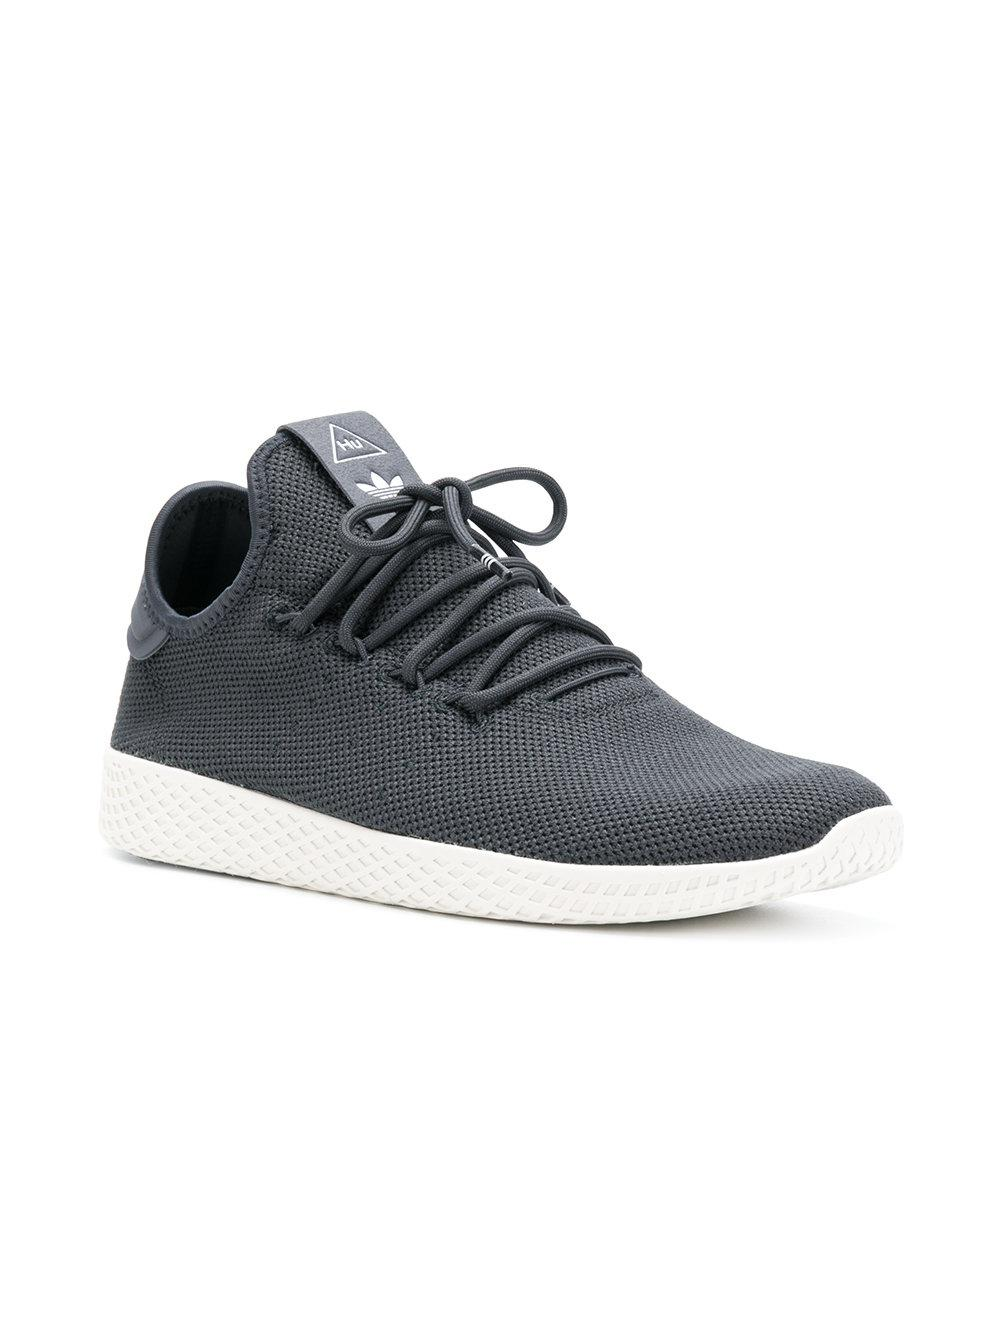 Adidas Originals Pw Tennis Hu Sneakers In Gray For Men Lyst